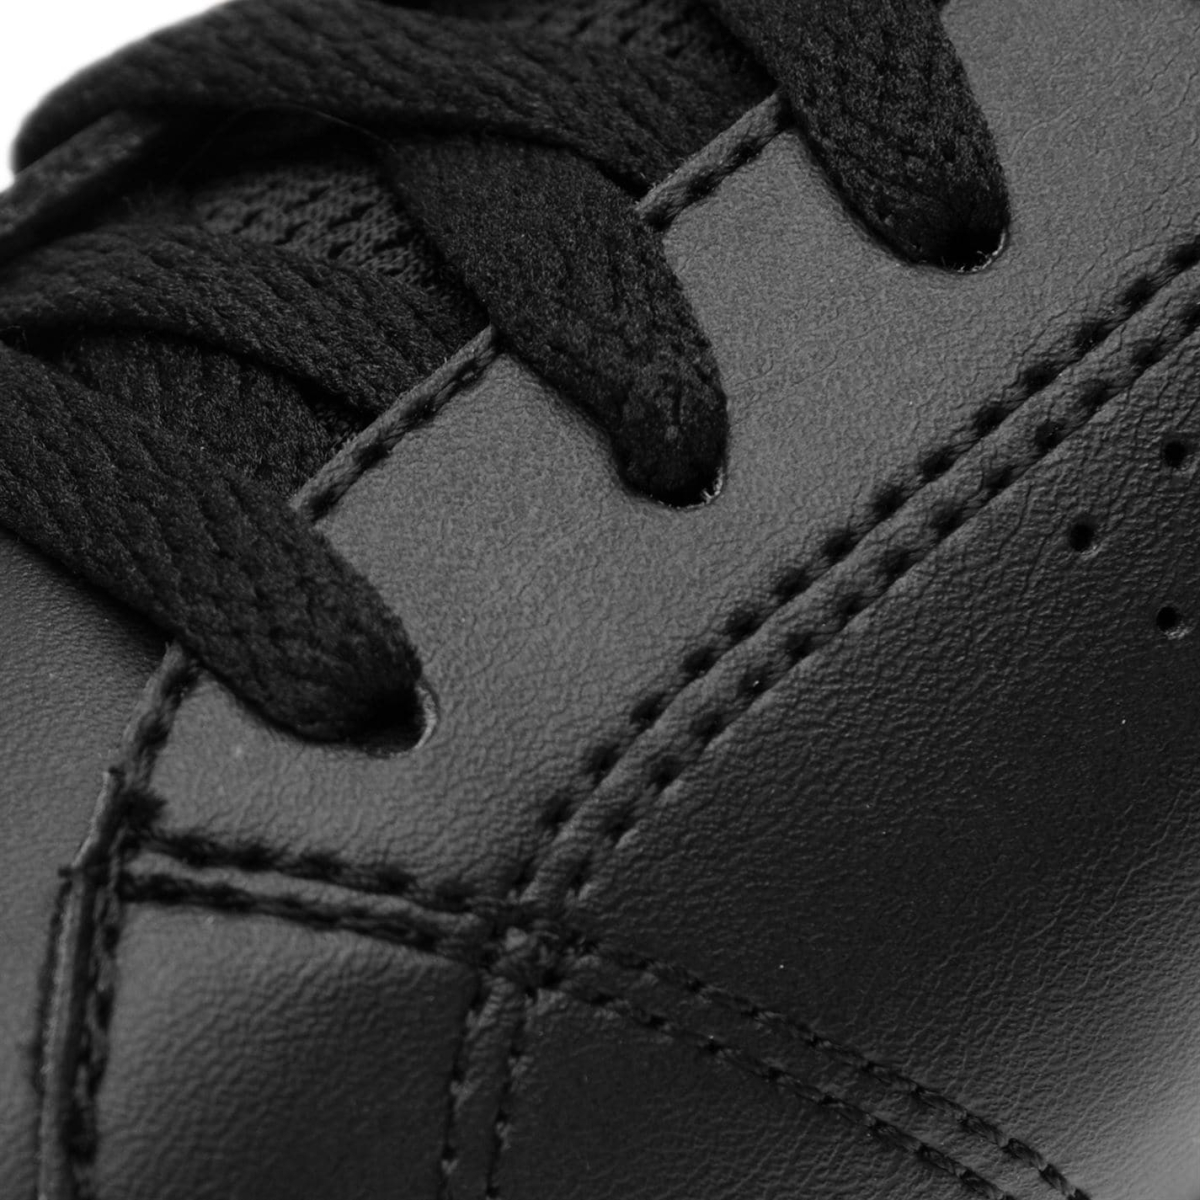 adidas-Advantage-Clean-Turnschuhe-Laufschuhe-Herren-Sneaker-Sportschuhe-3006 Indexbild 6